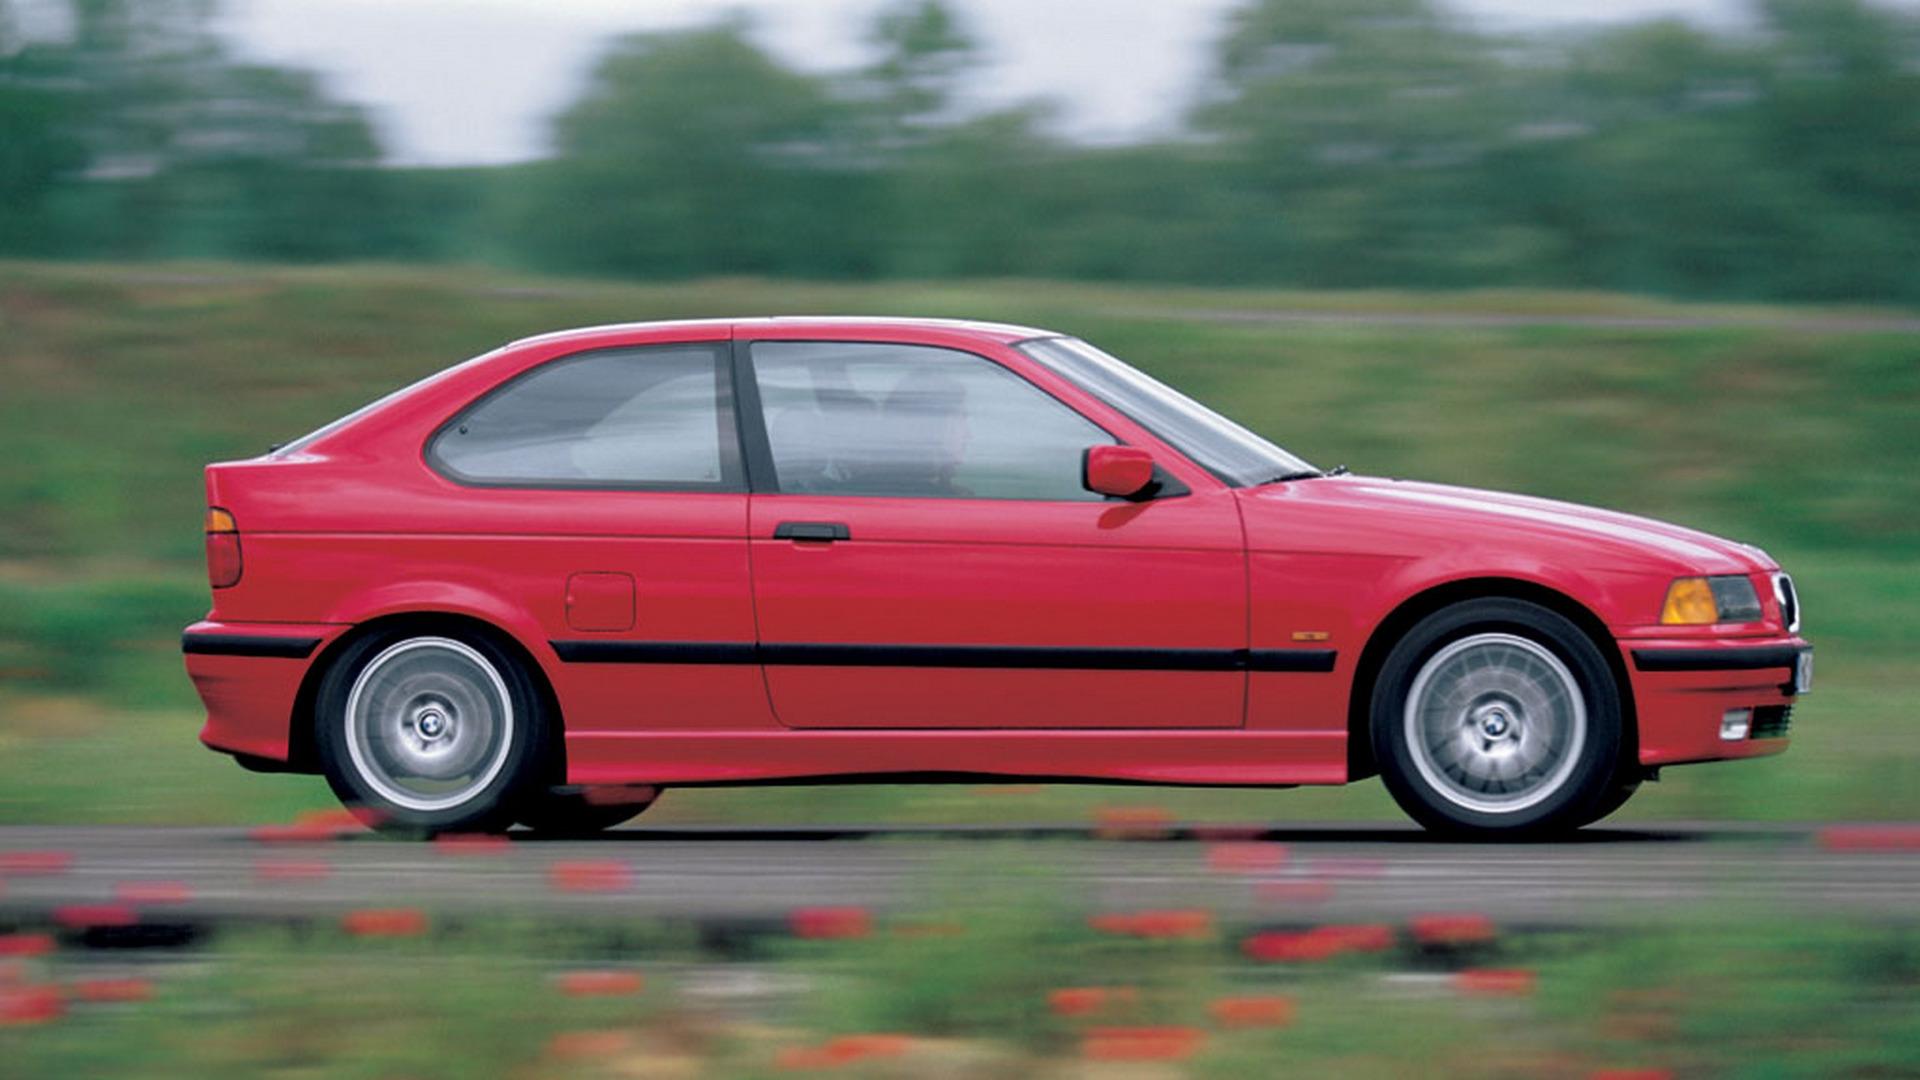 Worst Sports Cars BMW Series HatchbackCompact - Bmw 3 series hatchback